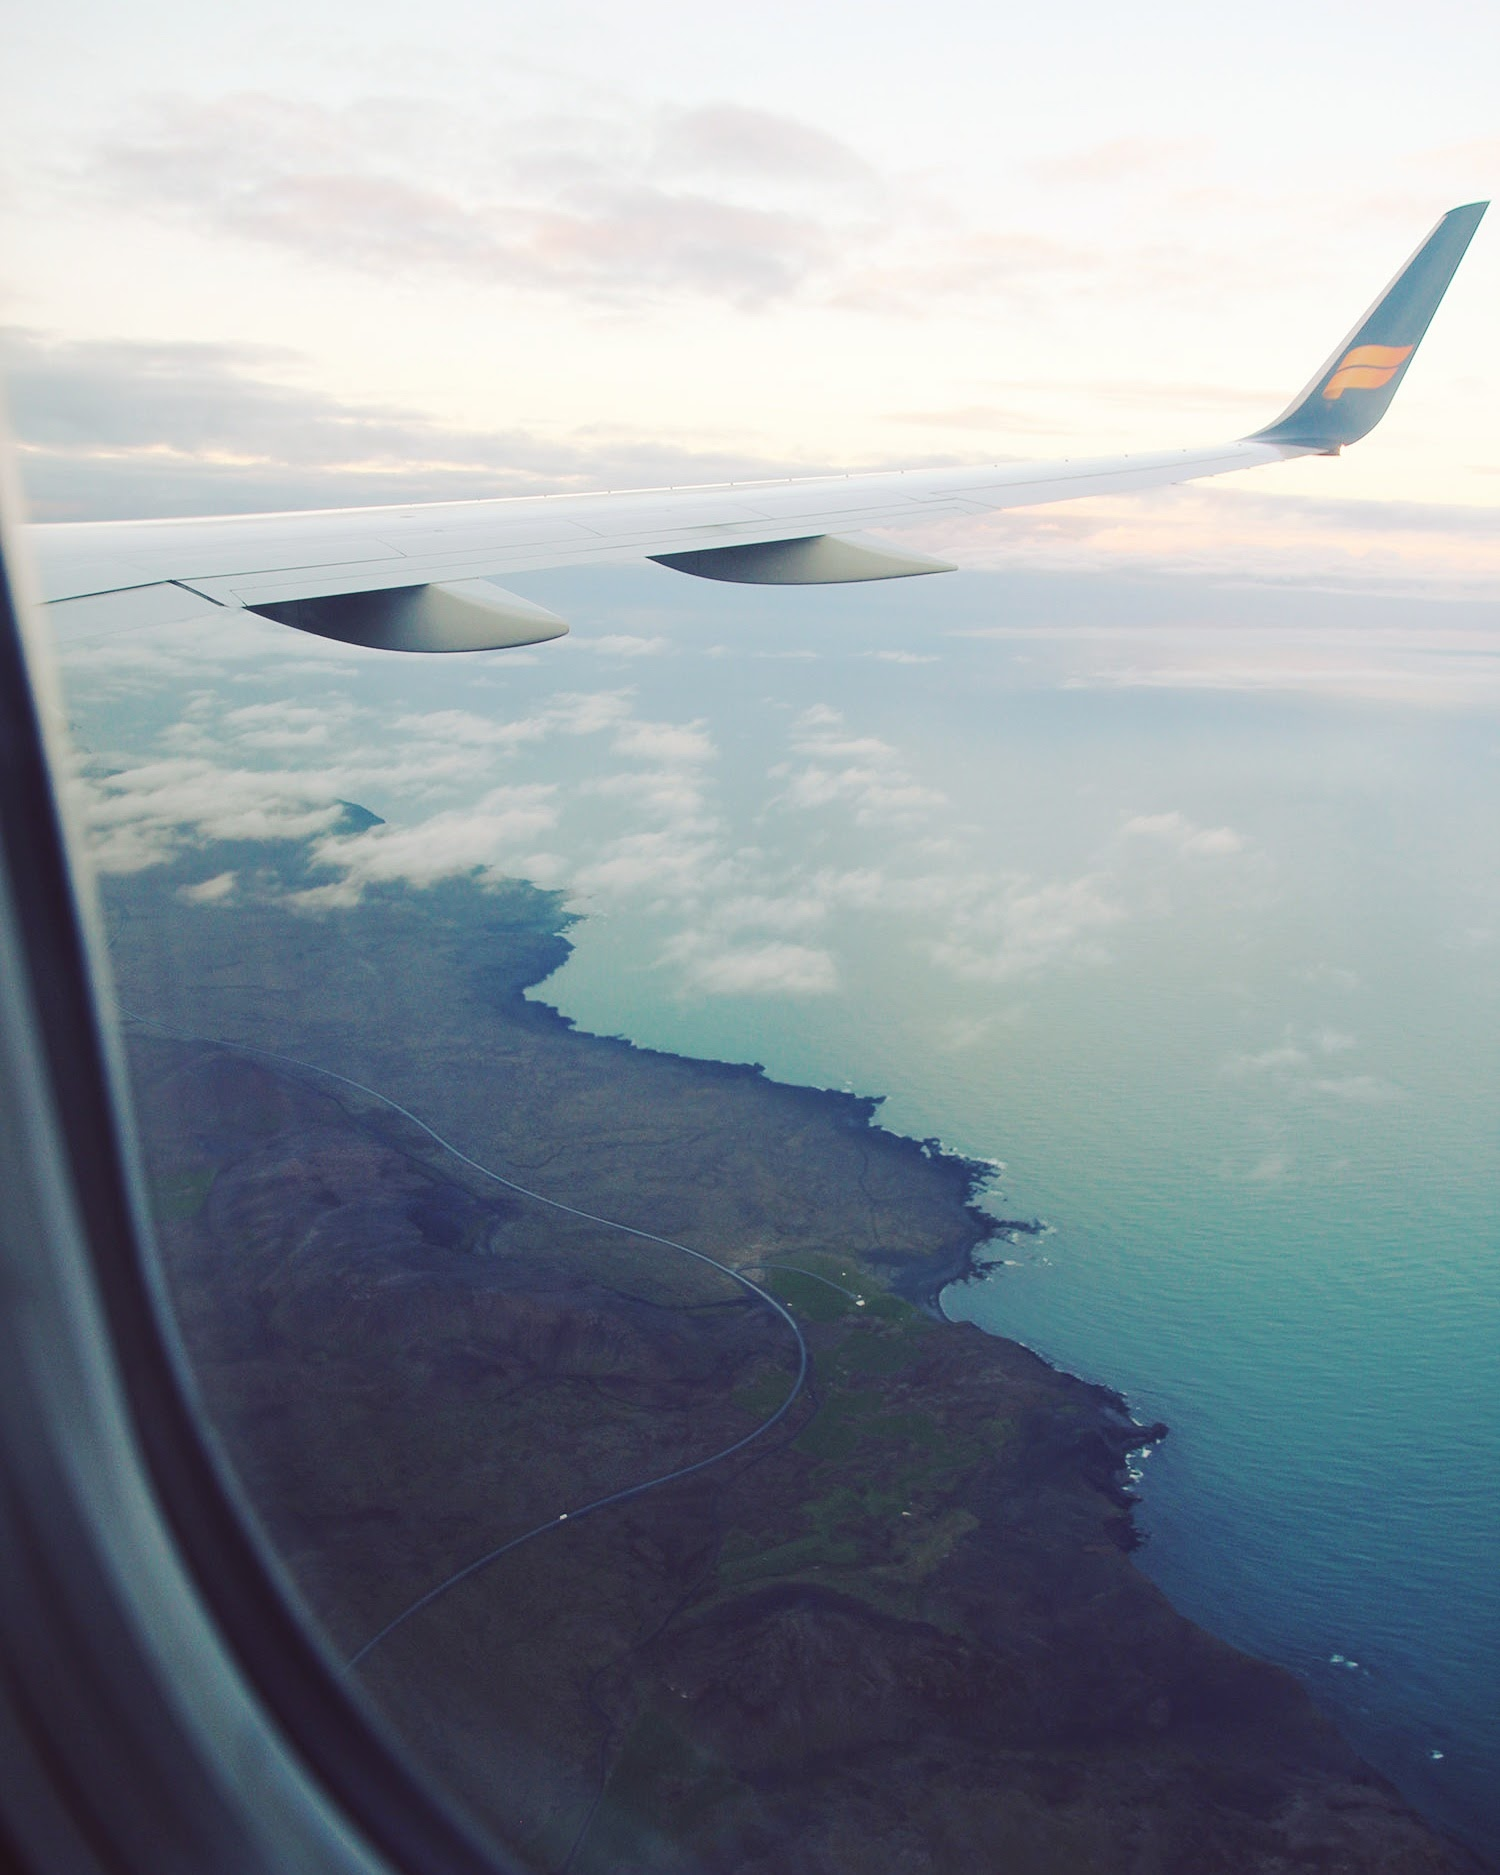 IcelandAir flight